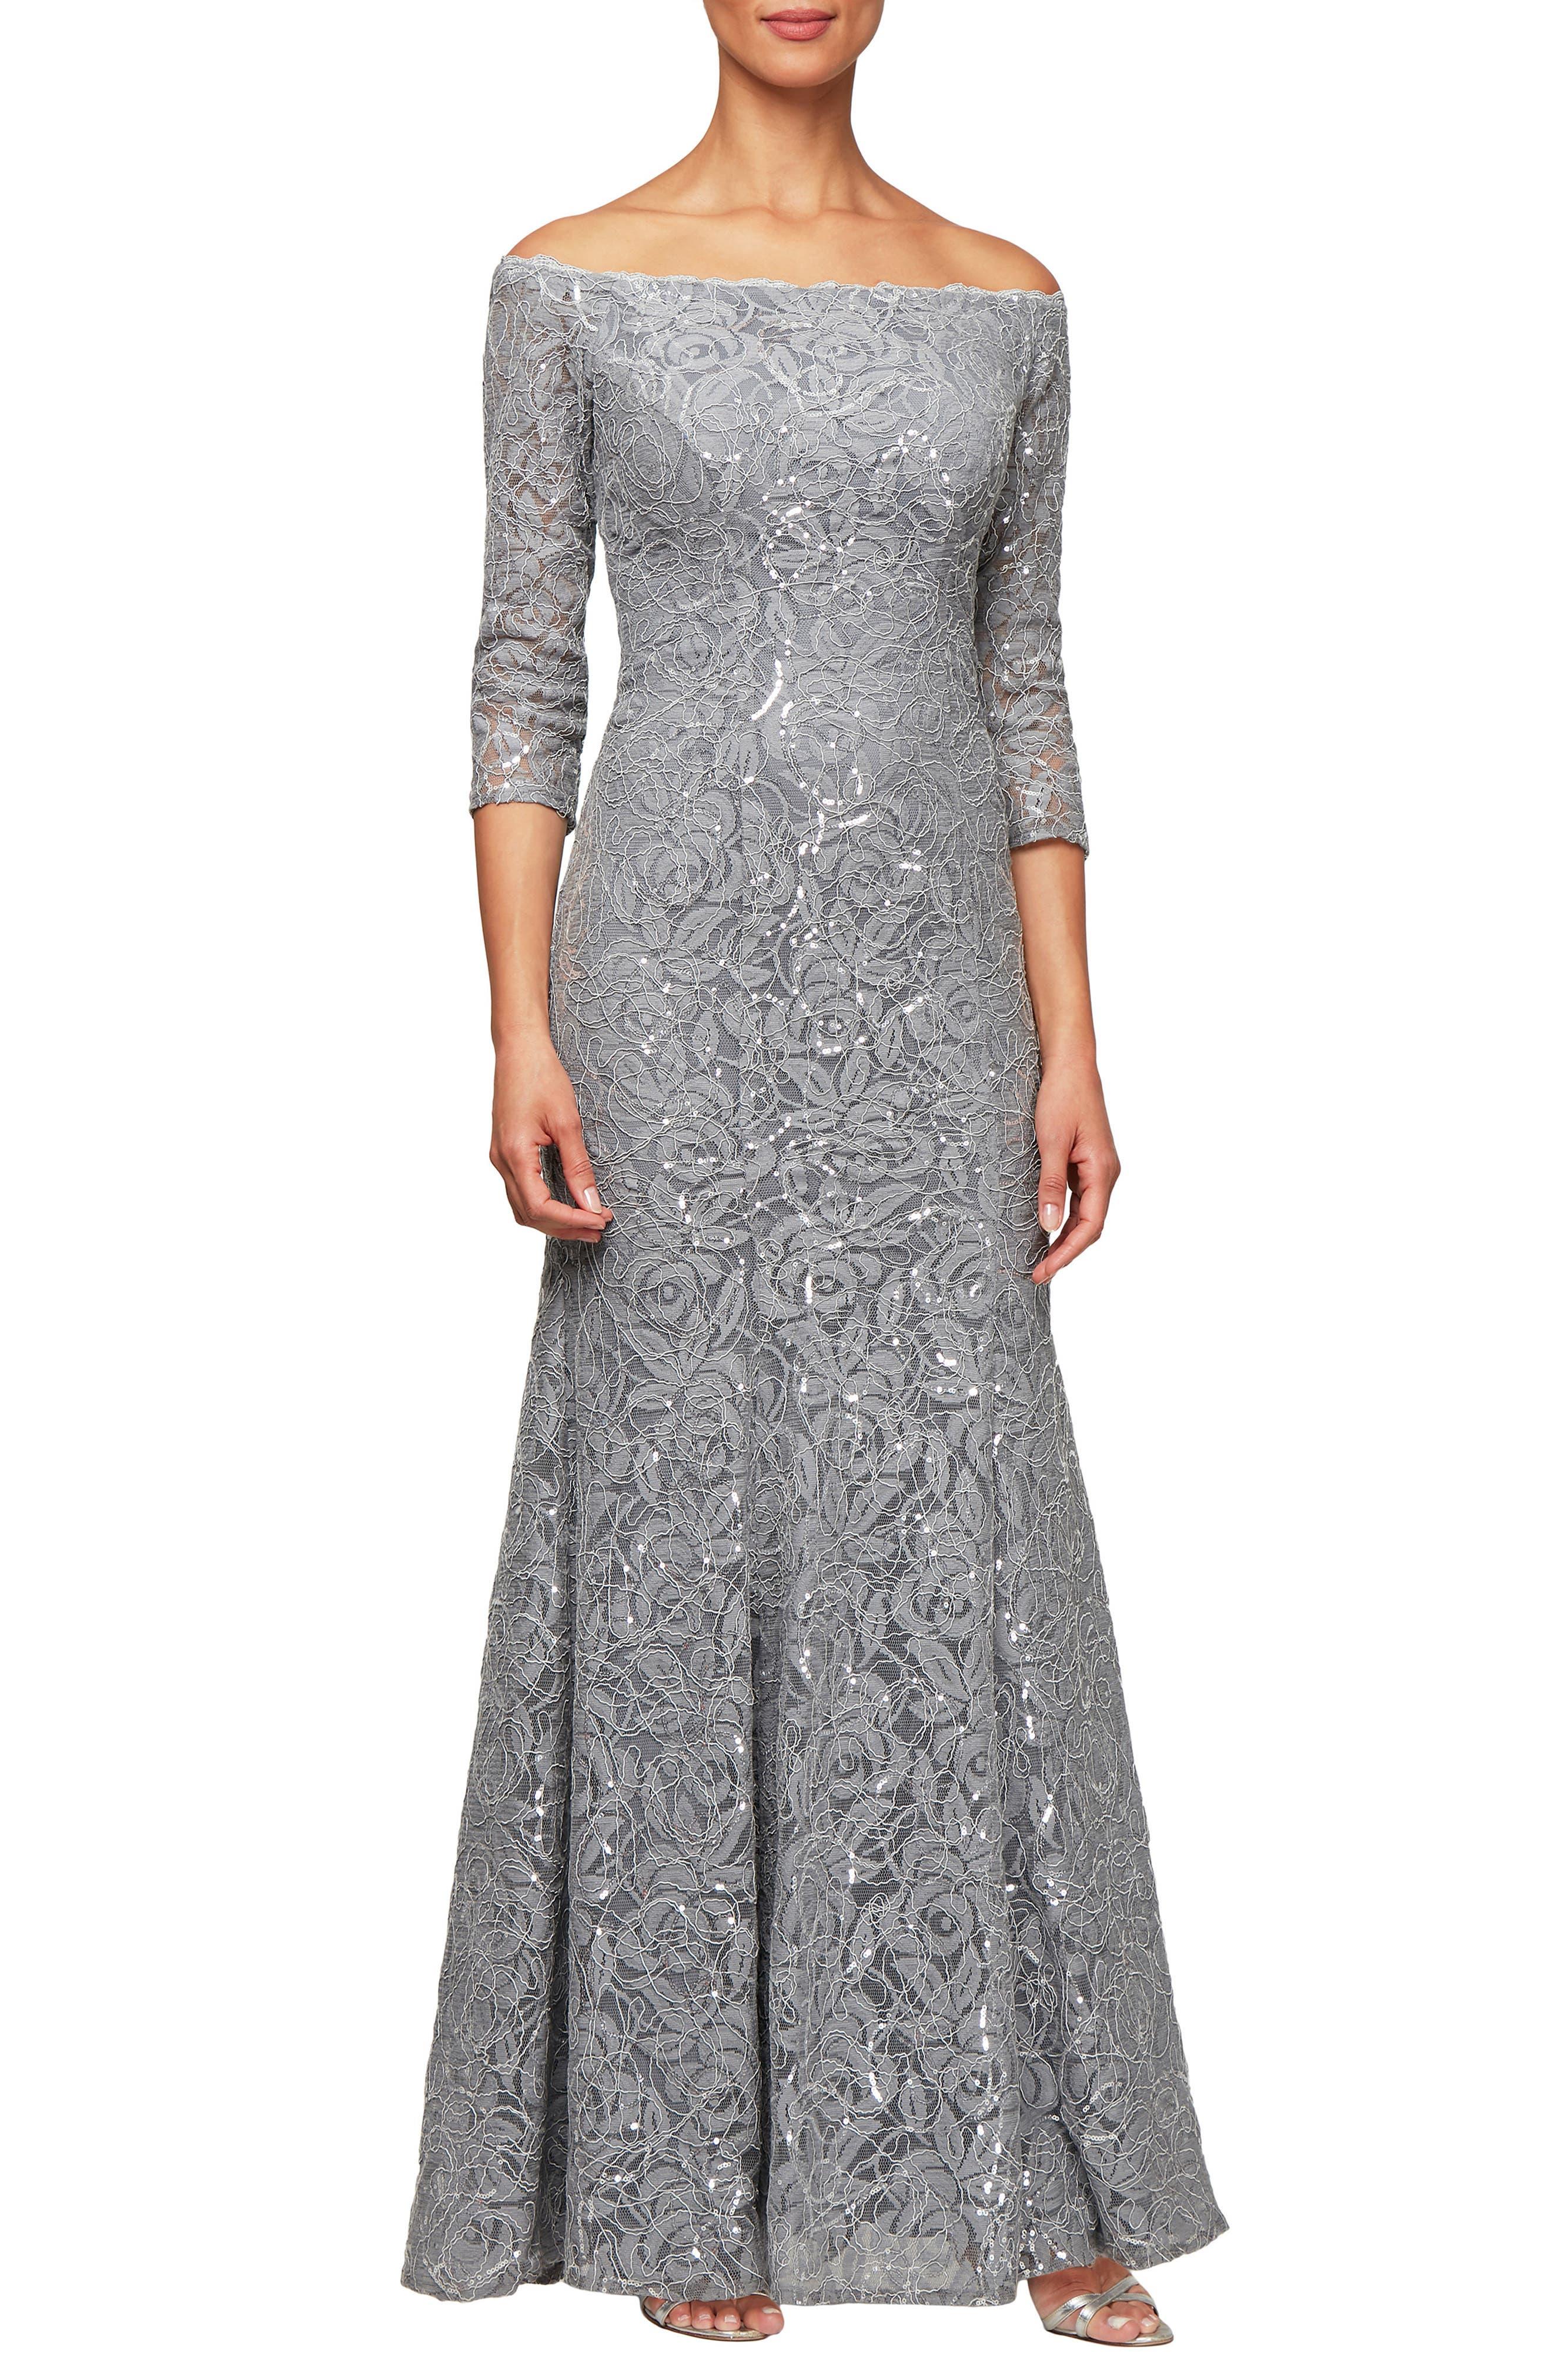 Alex Evenings Lace Off The Shoulder Evening Dress, Metallic